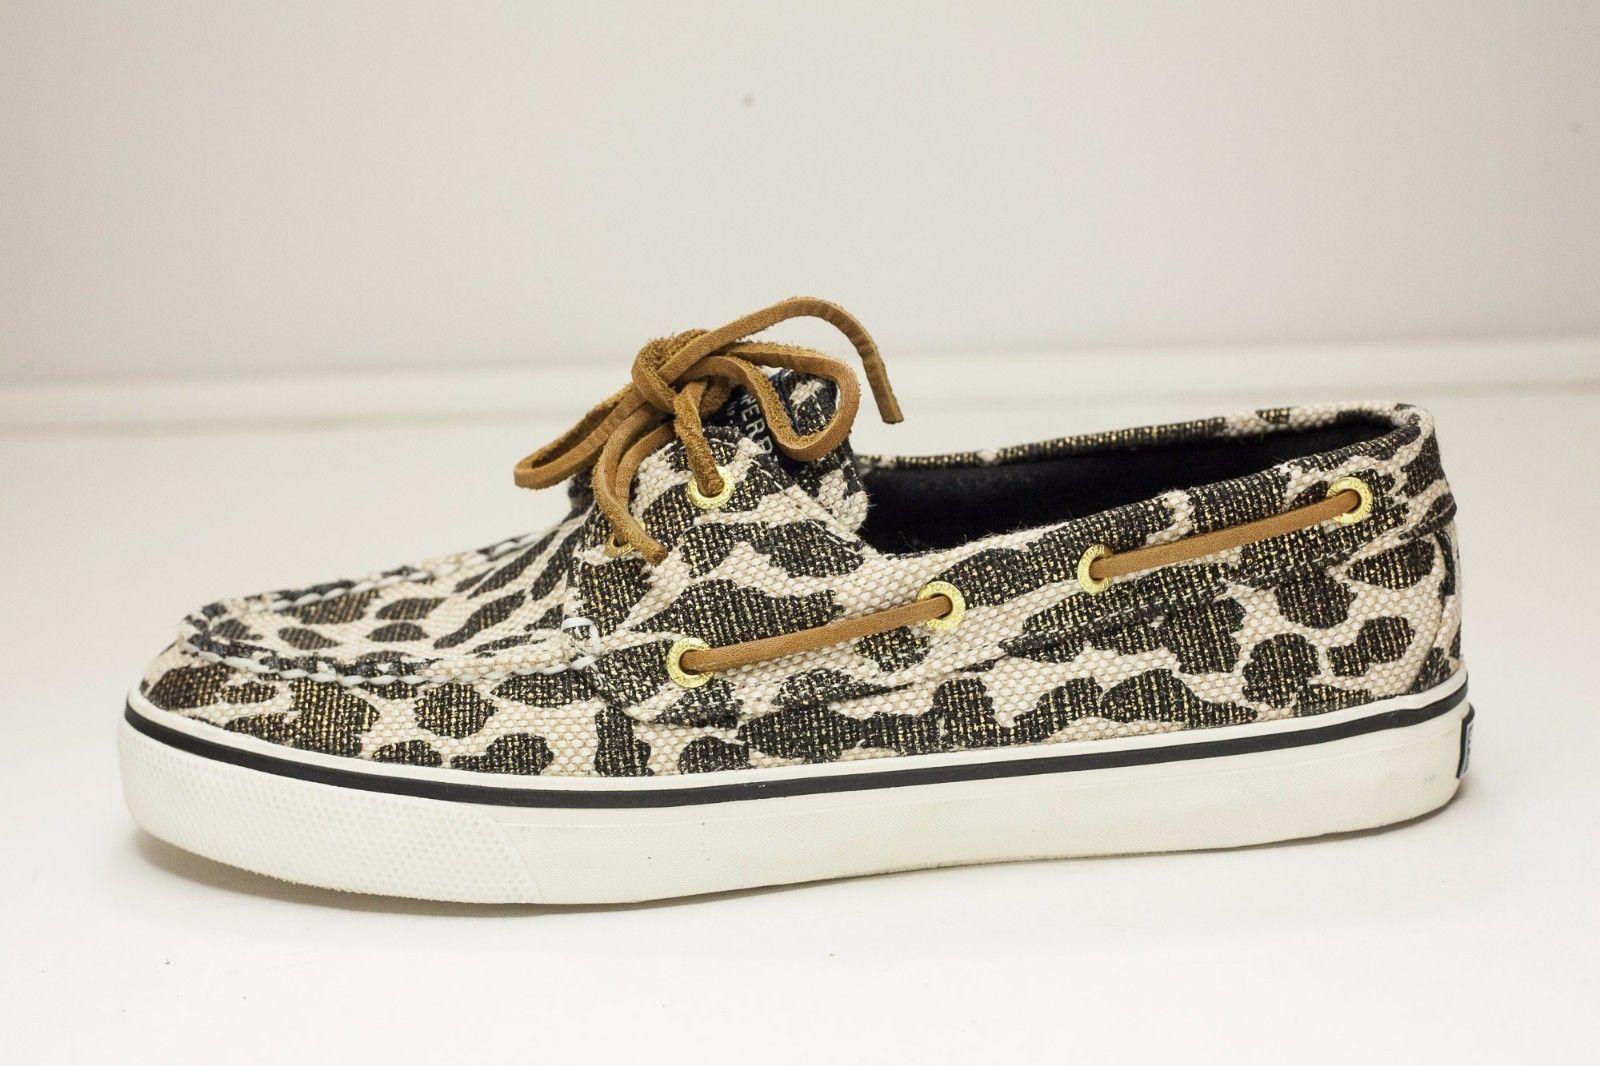 Sperry Top-Sider 7.5 Leopard Women's Boat Shoes